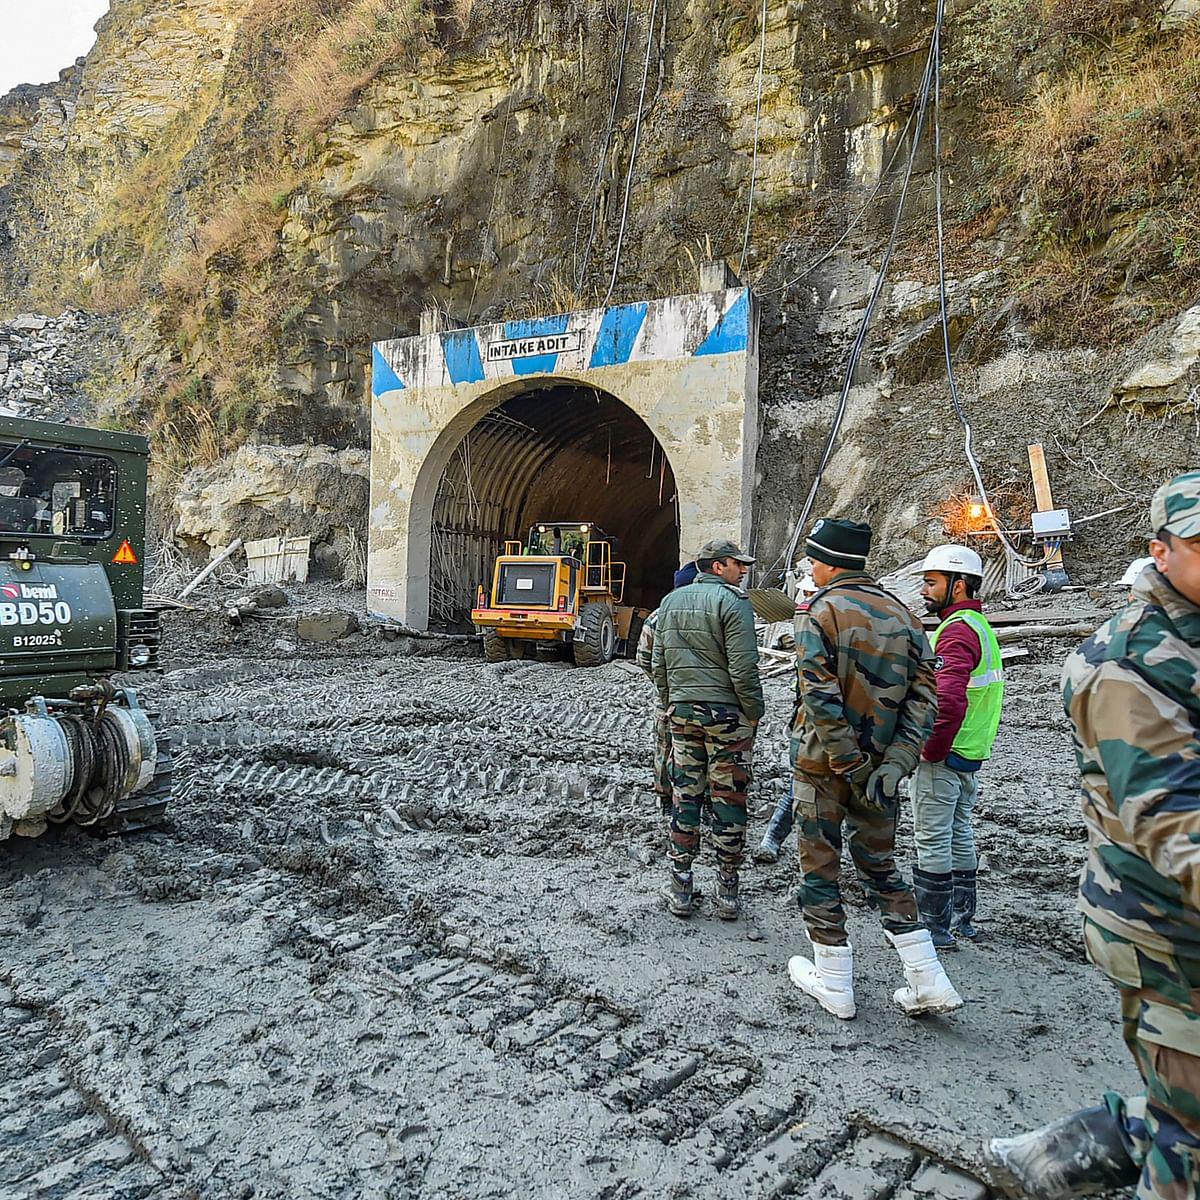 Uttarakhand glacier burst: Not much progress in rescue operation, says DGP